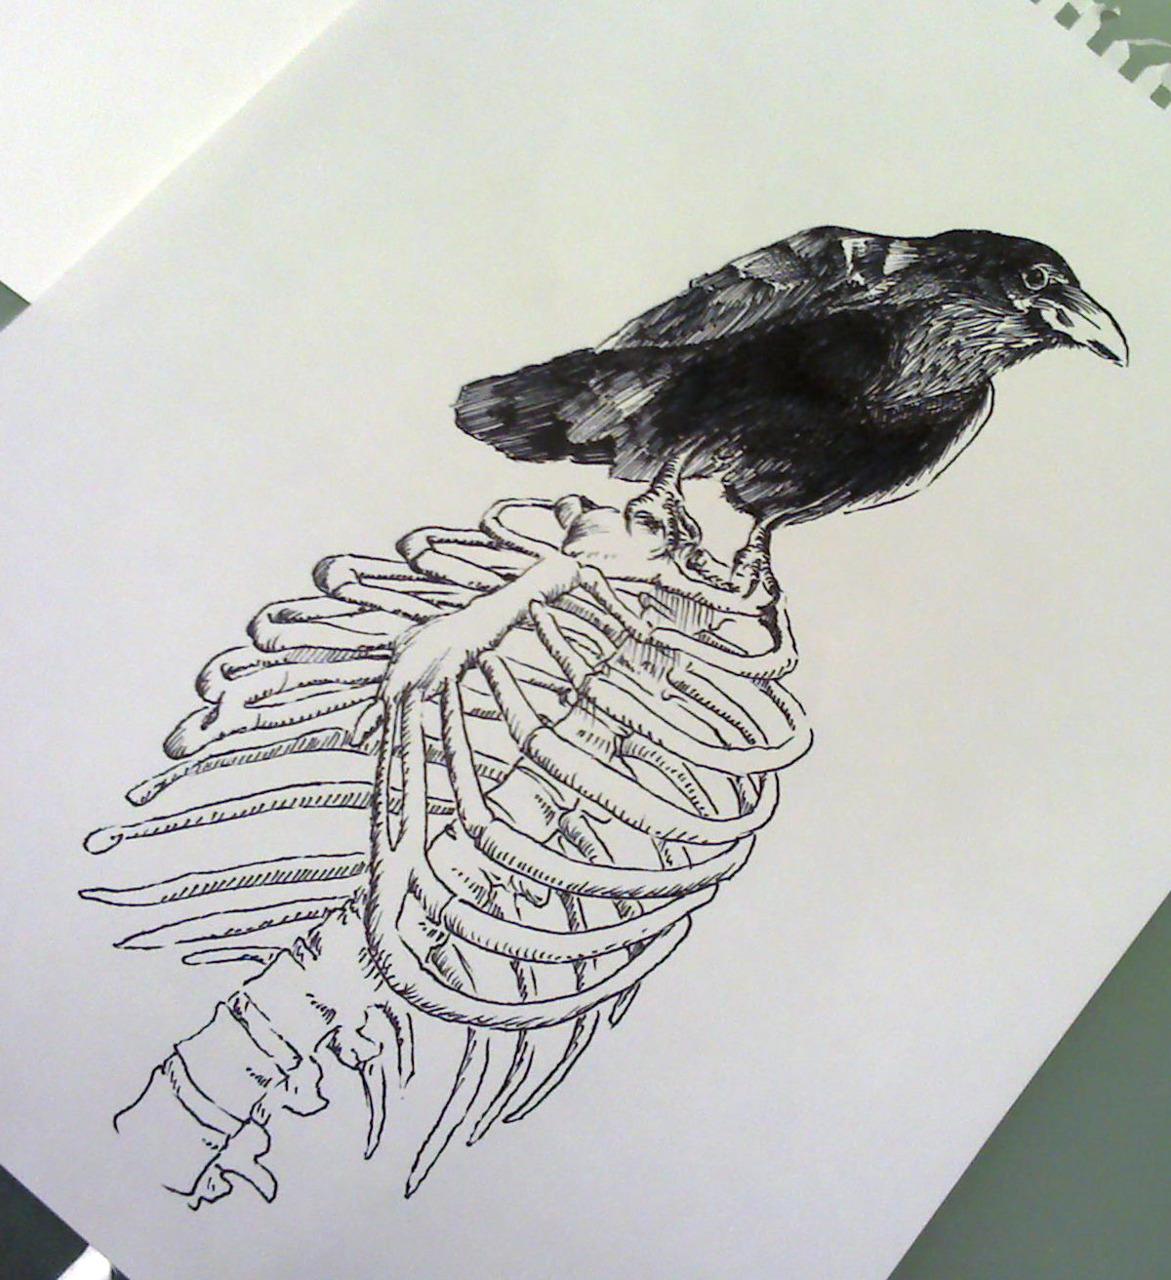 Black Raven Sitting On Human Skeleton Chest Tattoo Design